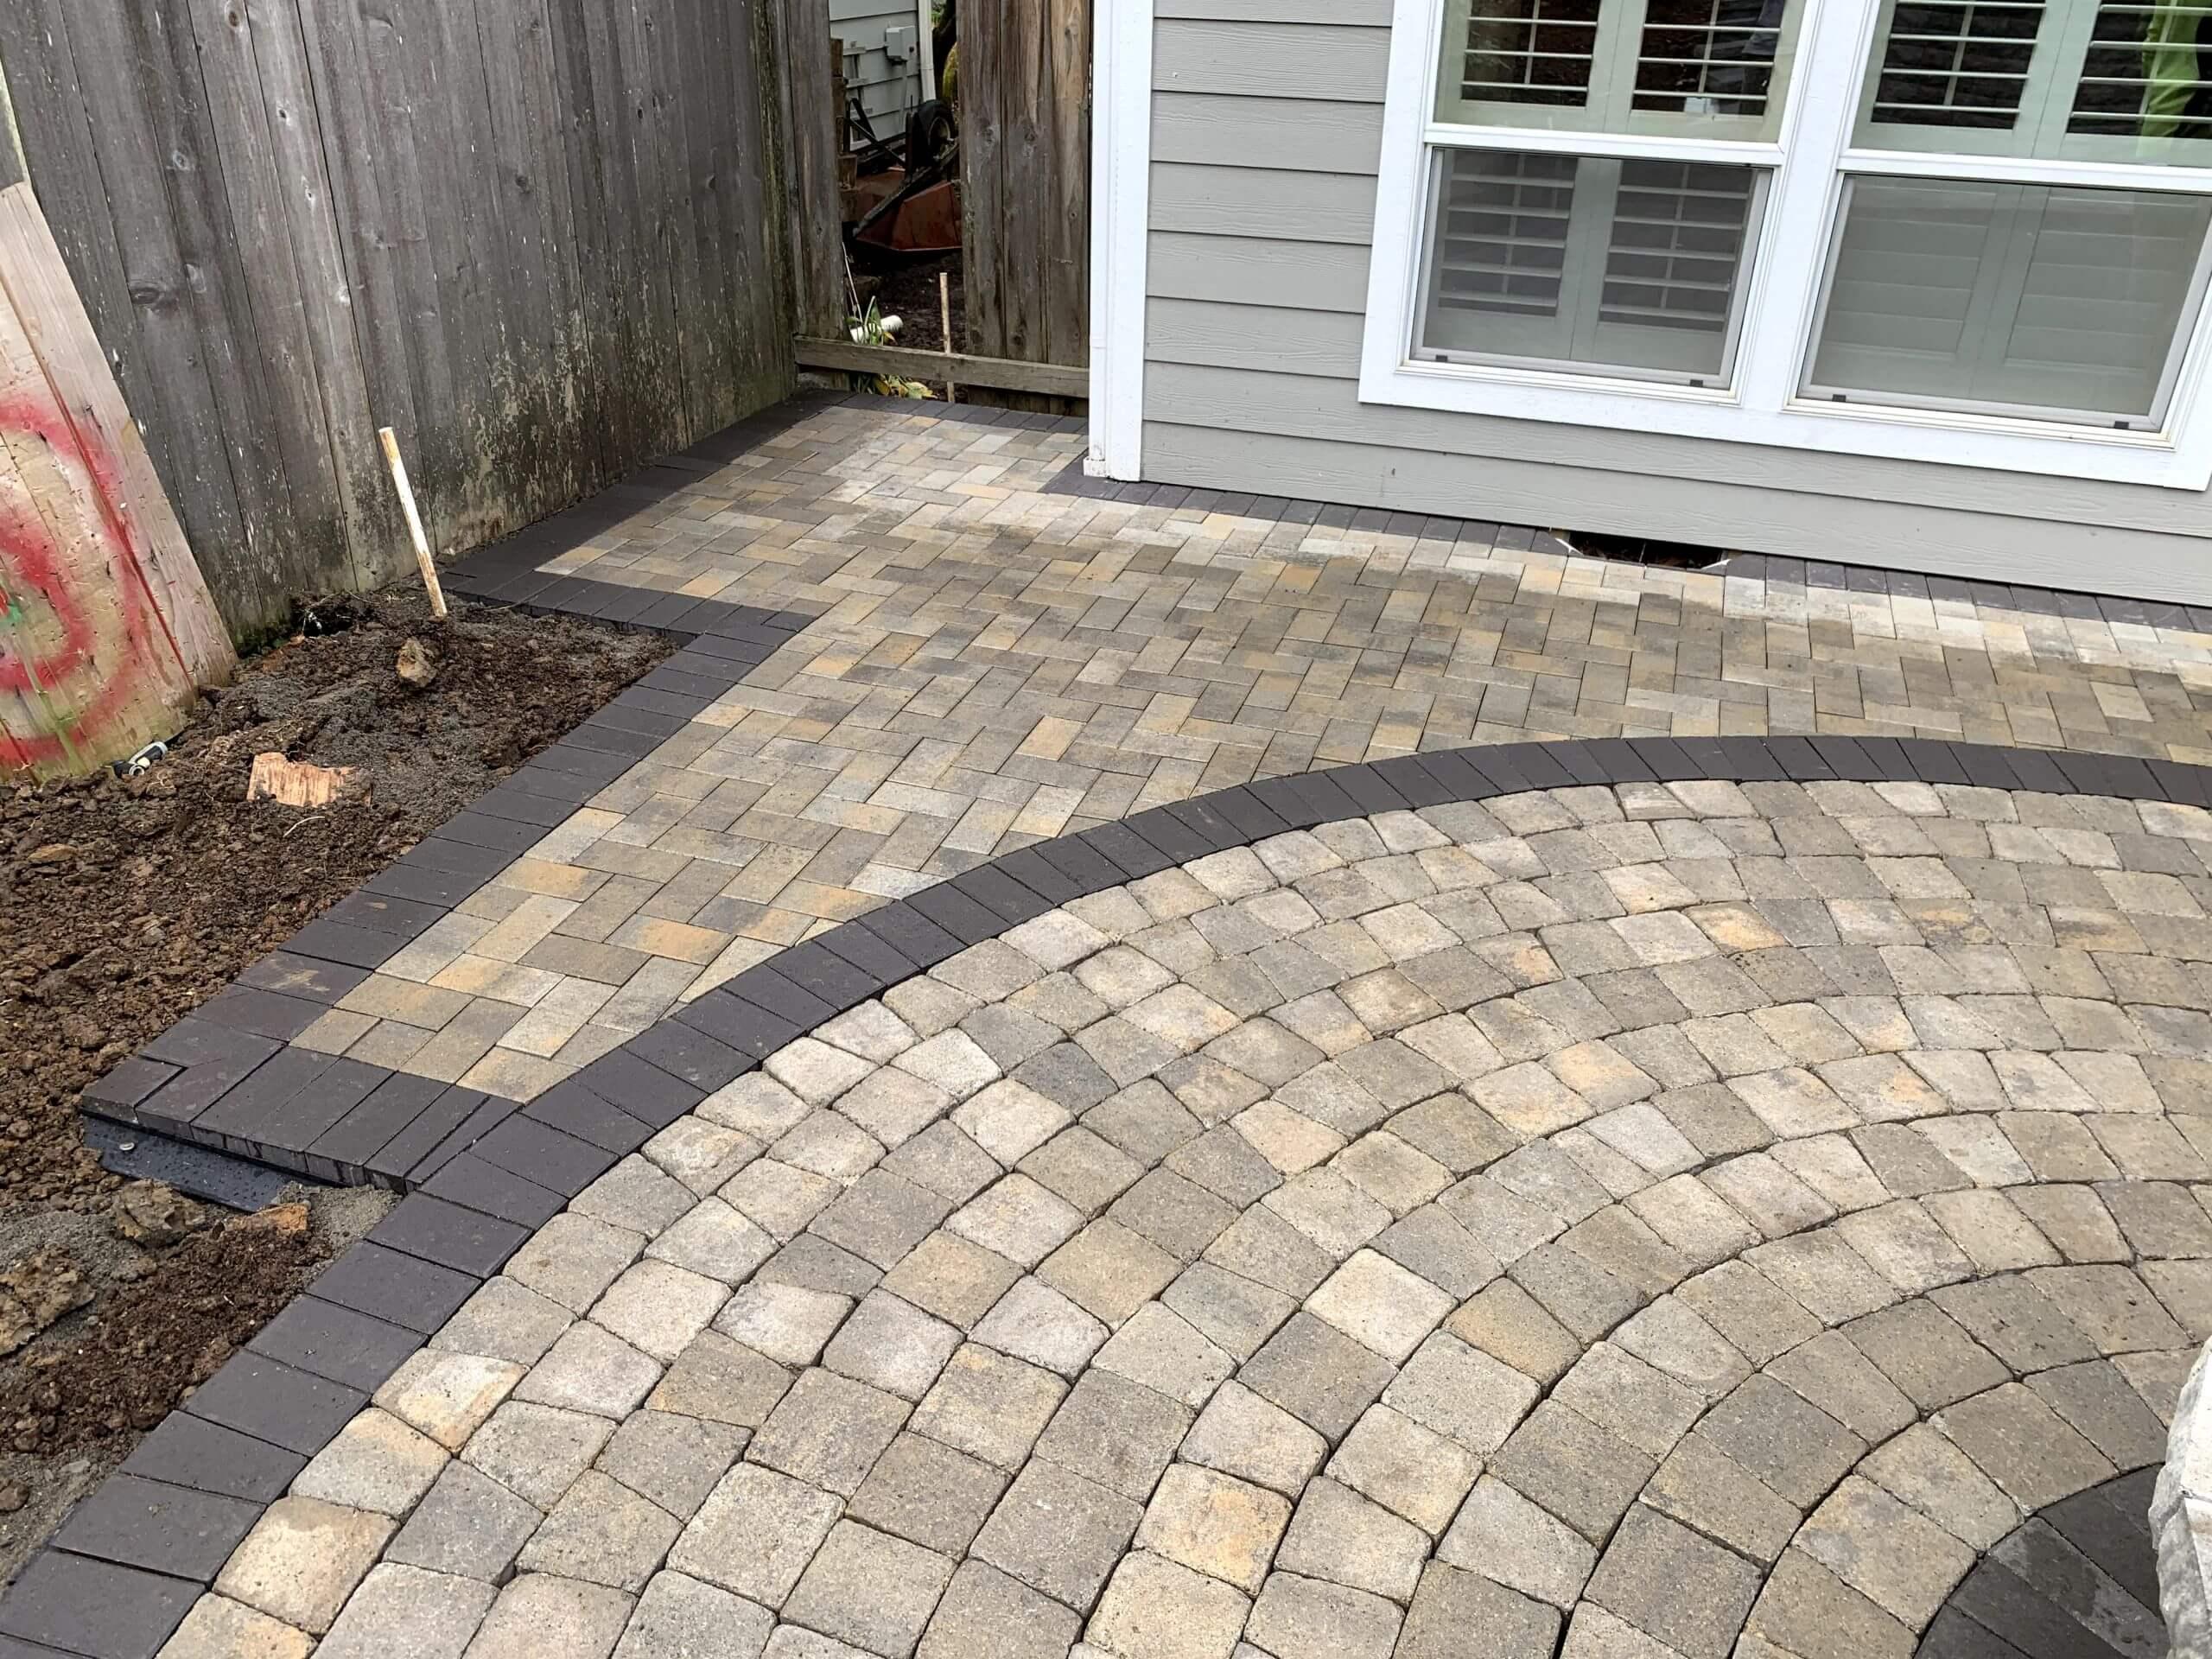 https://shovelandthumb.sfo3.digitaloceanspaces.com/patios walkways/patio 3